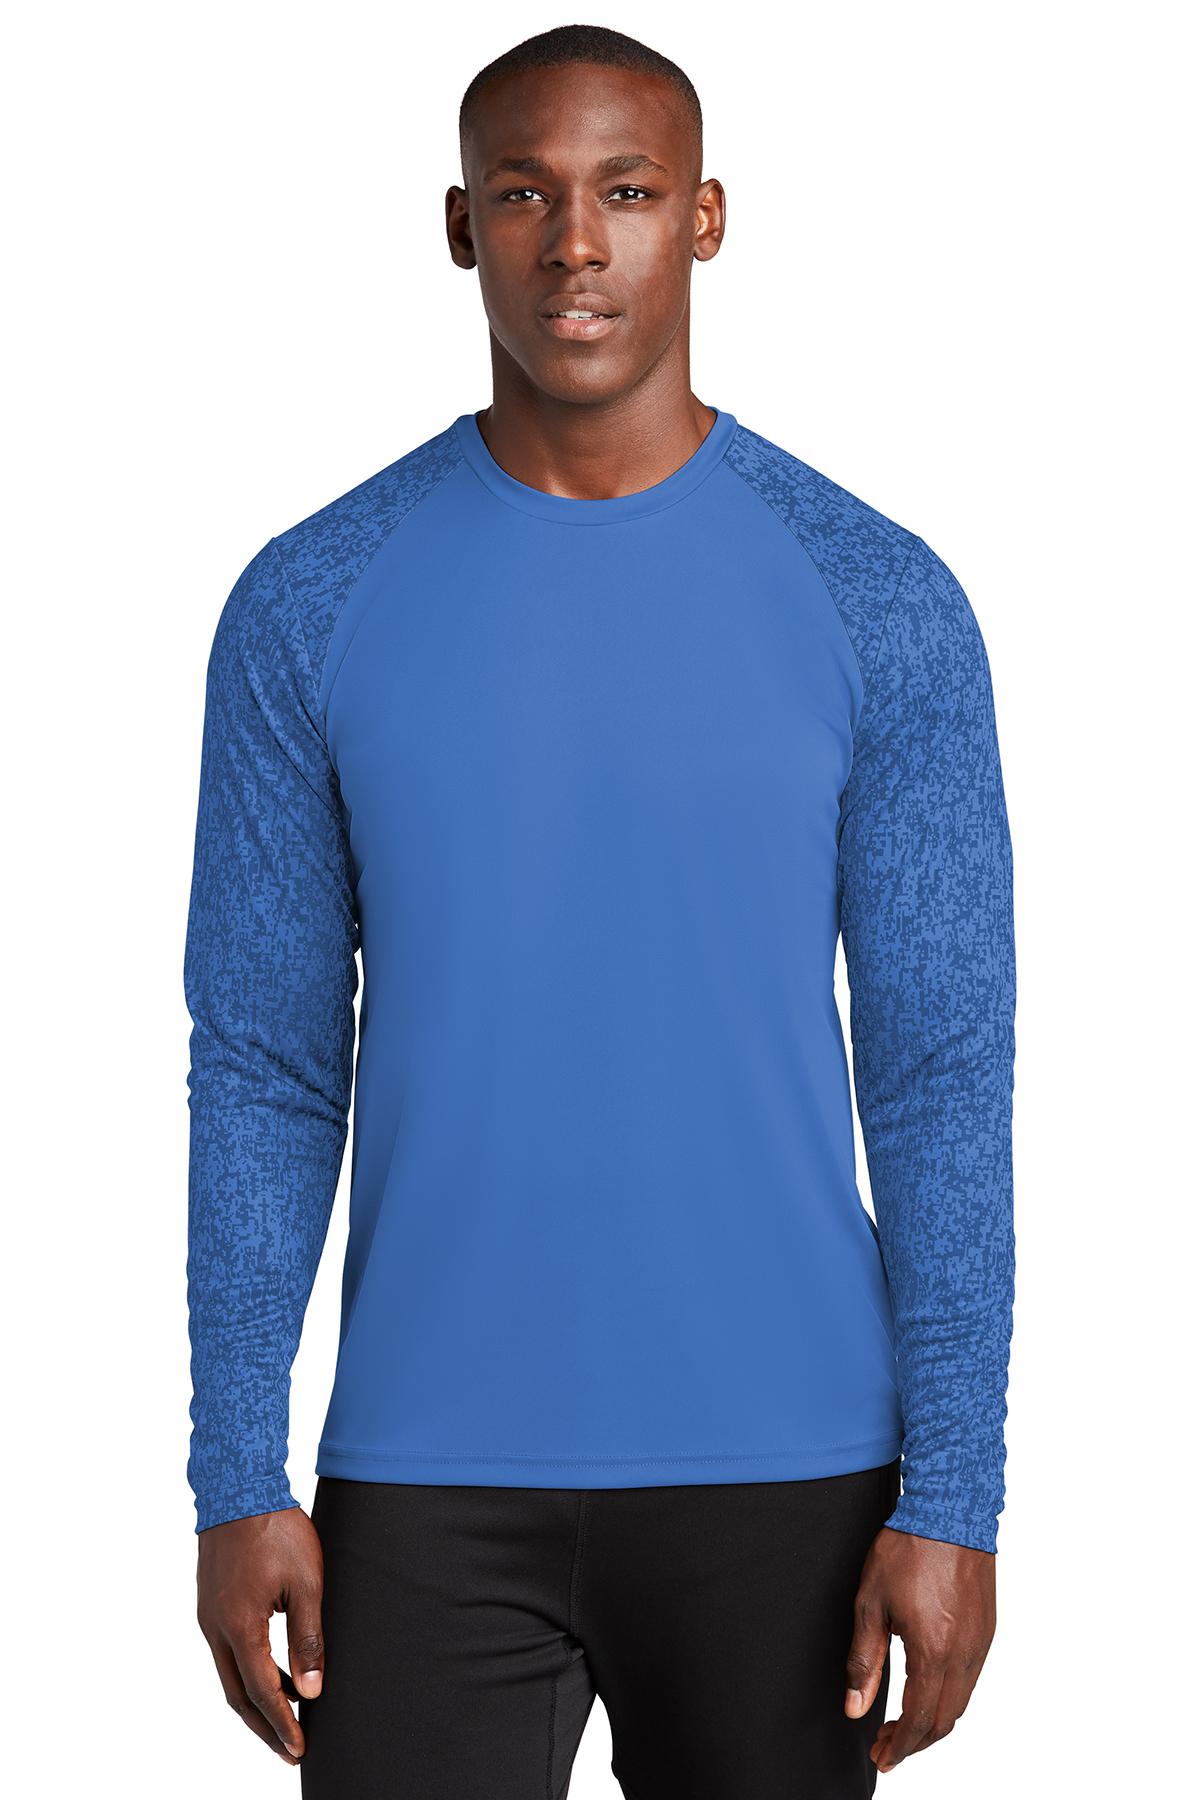 Sport Tek Long Sleeve Digi Camo Tee Performance T Shirts Sport Tek — choose a quantity of sport tek long sleeve. sport tek long sleeve digi camo tee performance t shirts sport tek